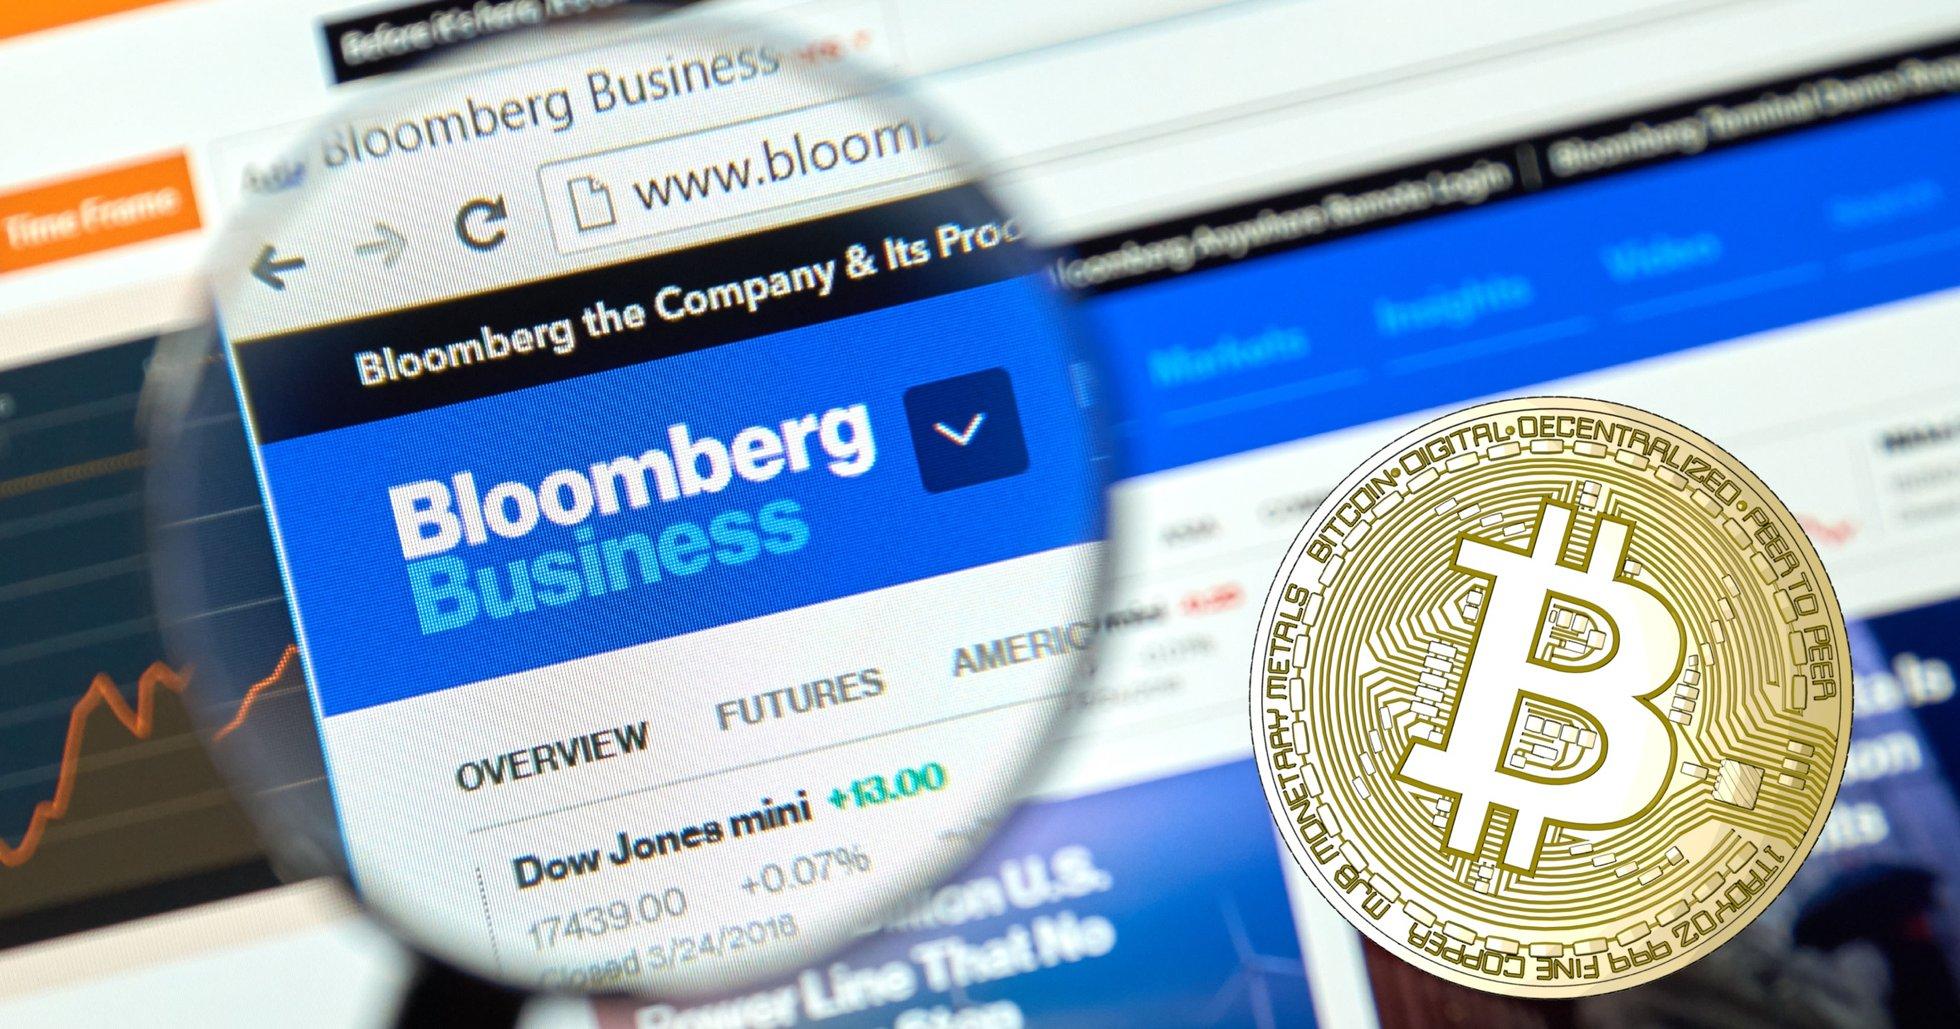 Bloomberg i ny analys: Då kan bitcoinpriset nå 100 000 dollar